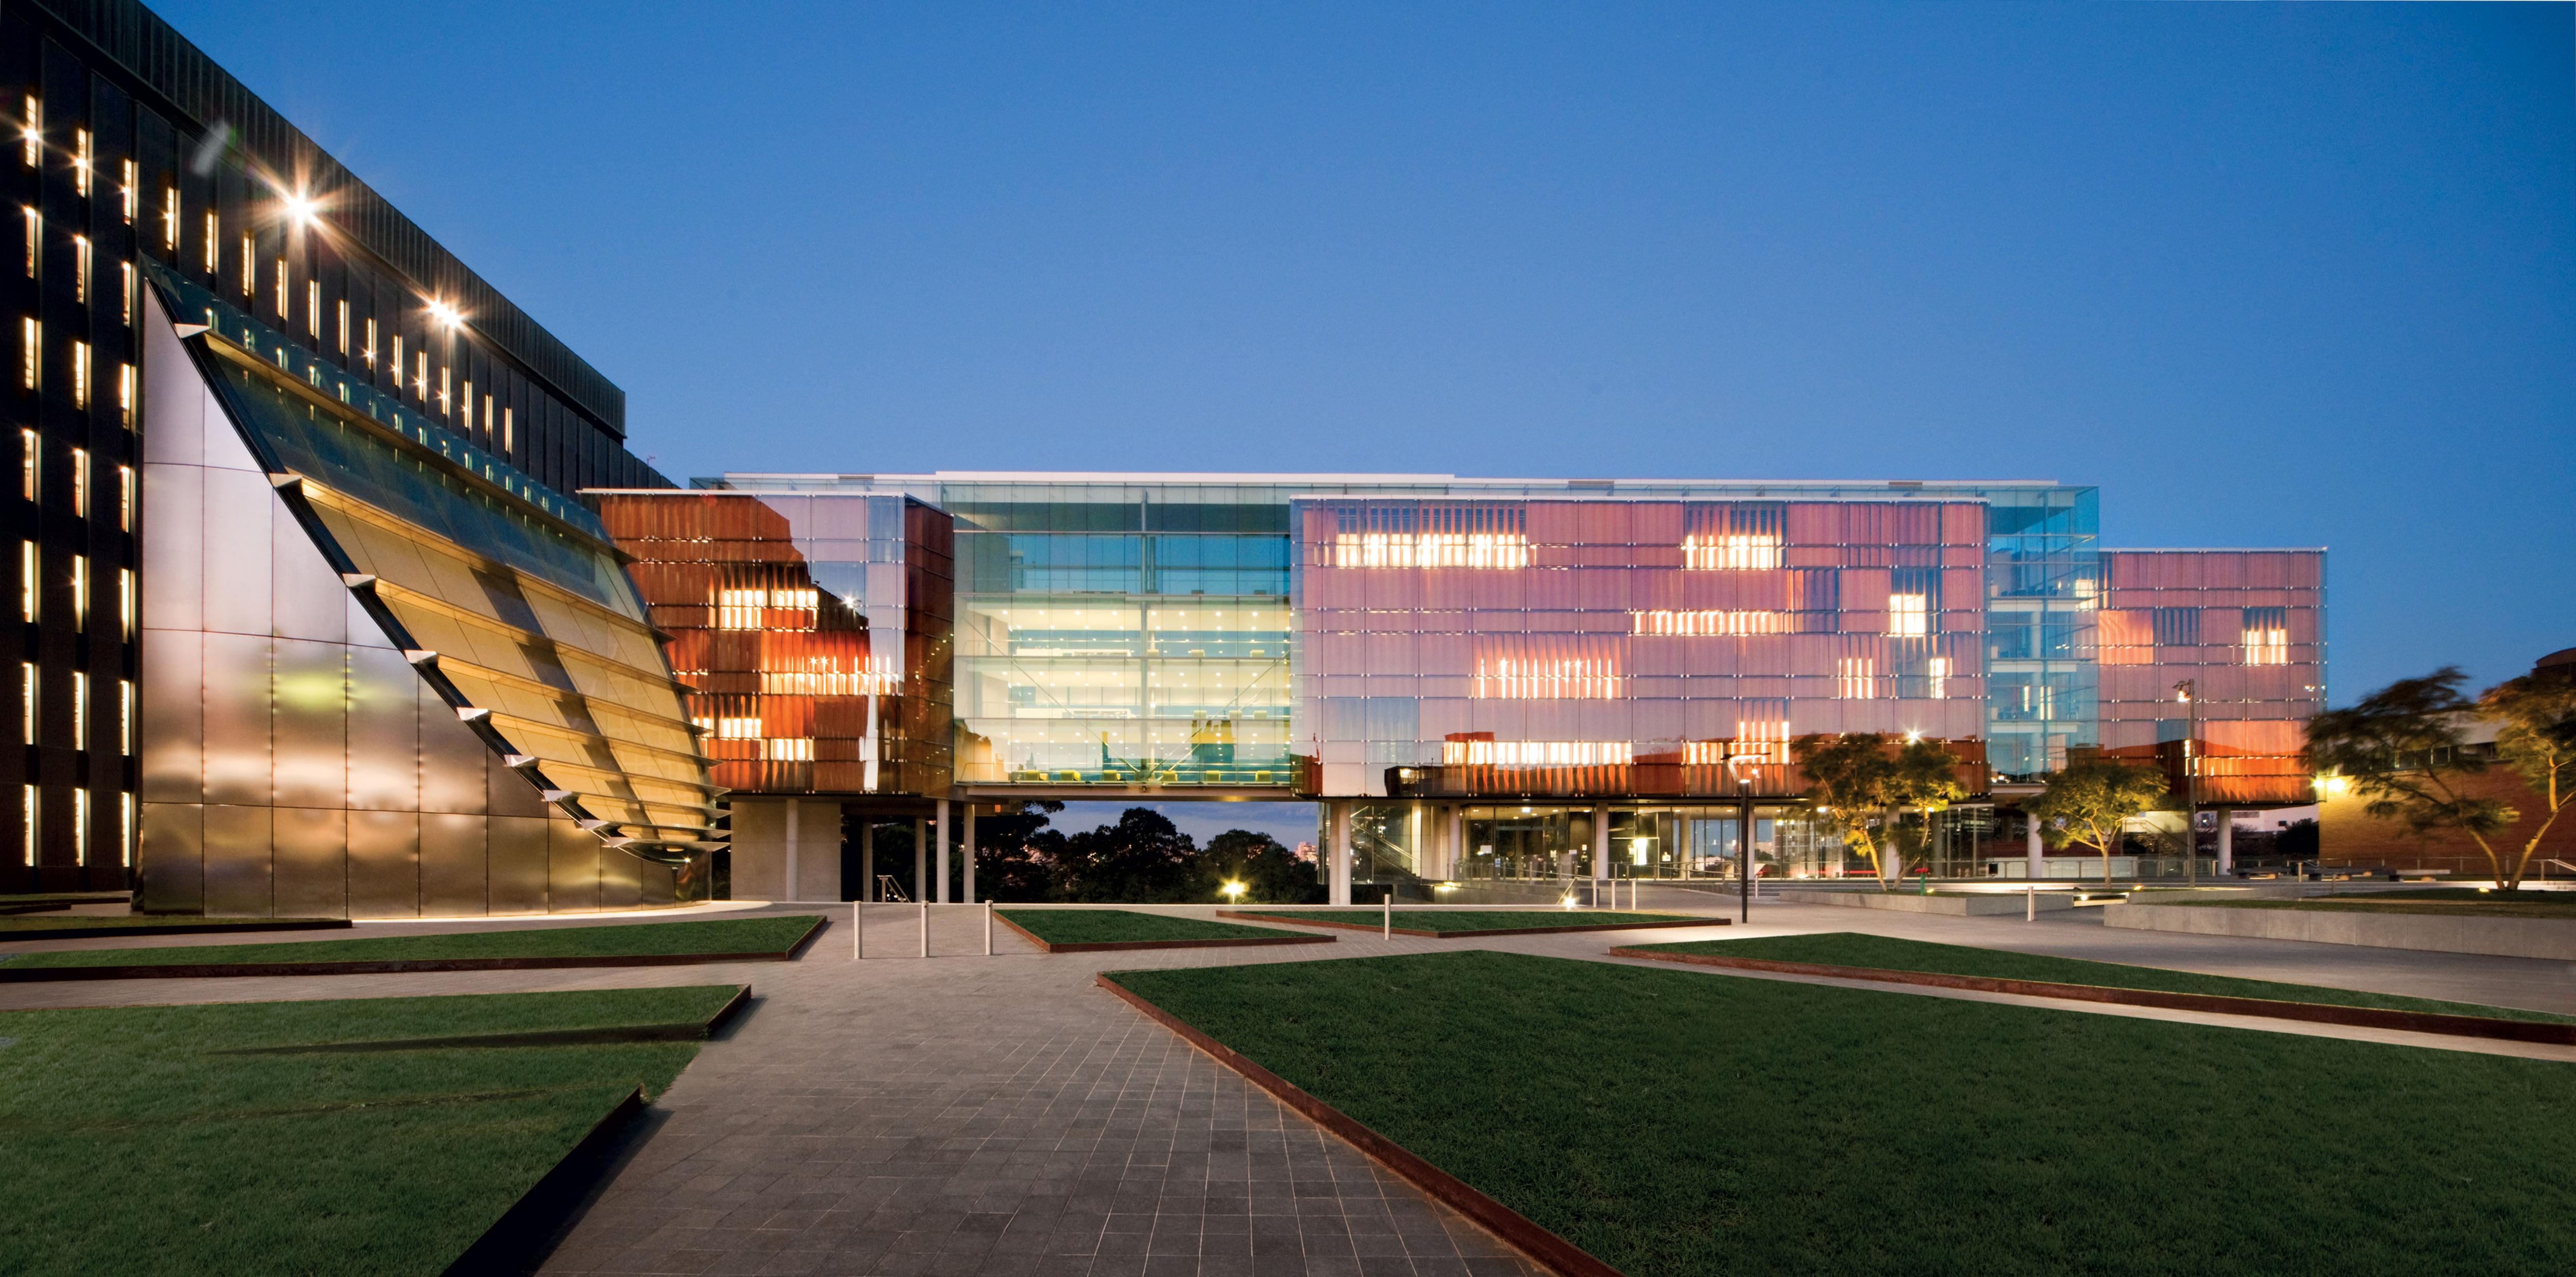 sydneys medical school feature - HD1600×1000